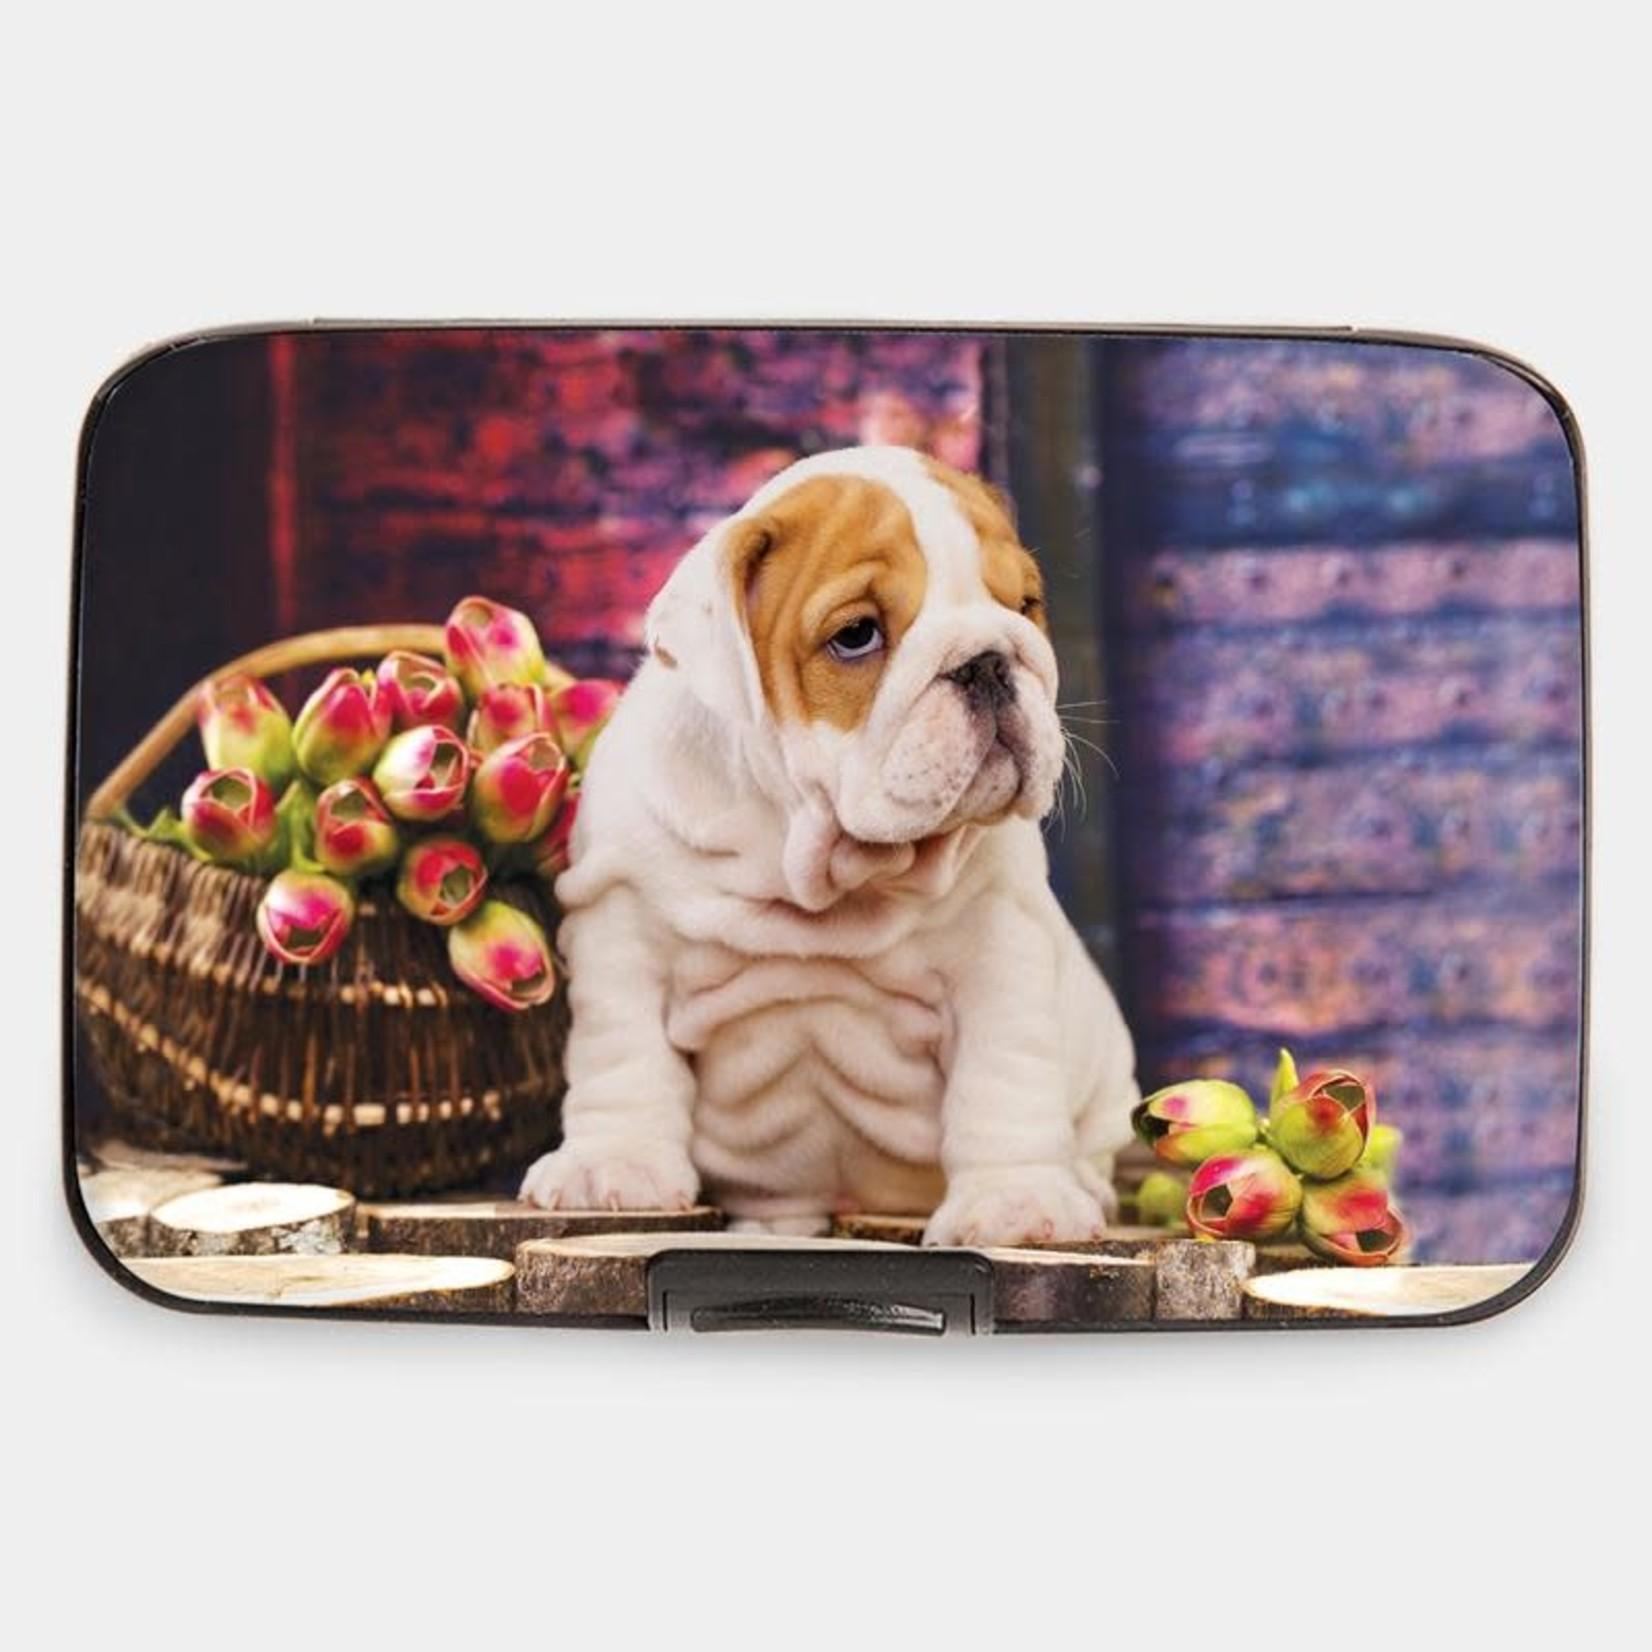 Monarque Armored Wallet - Puppies Bulldog